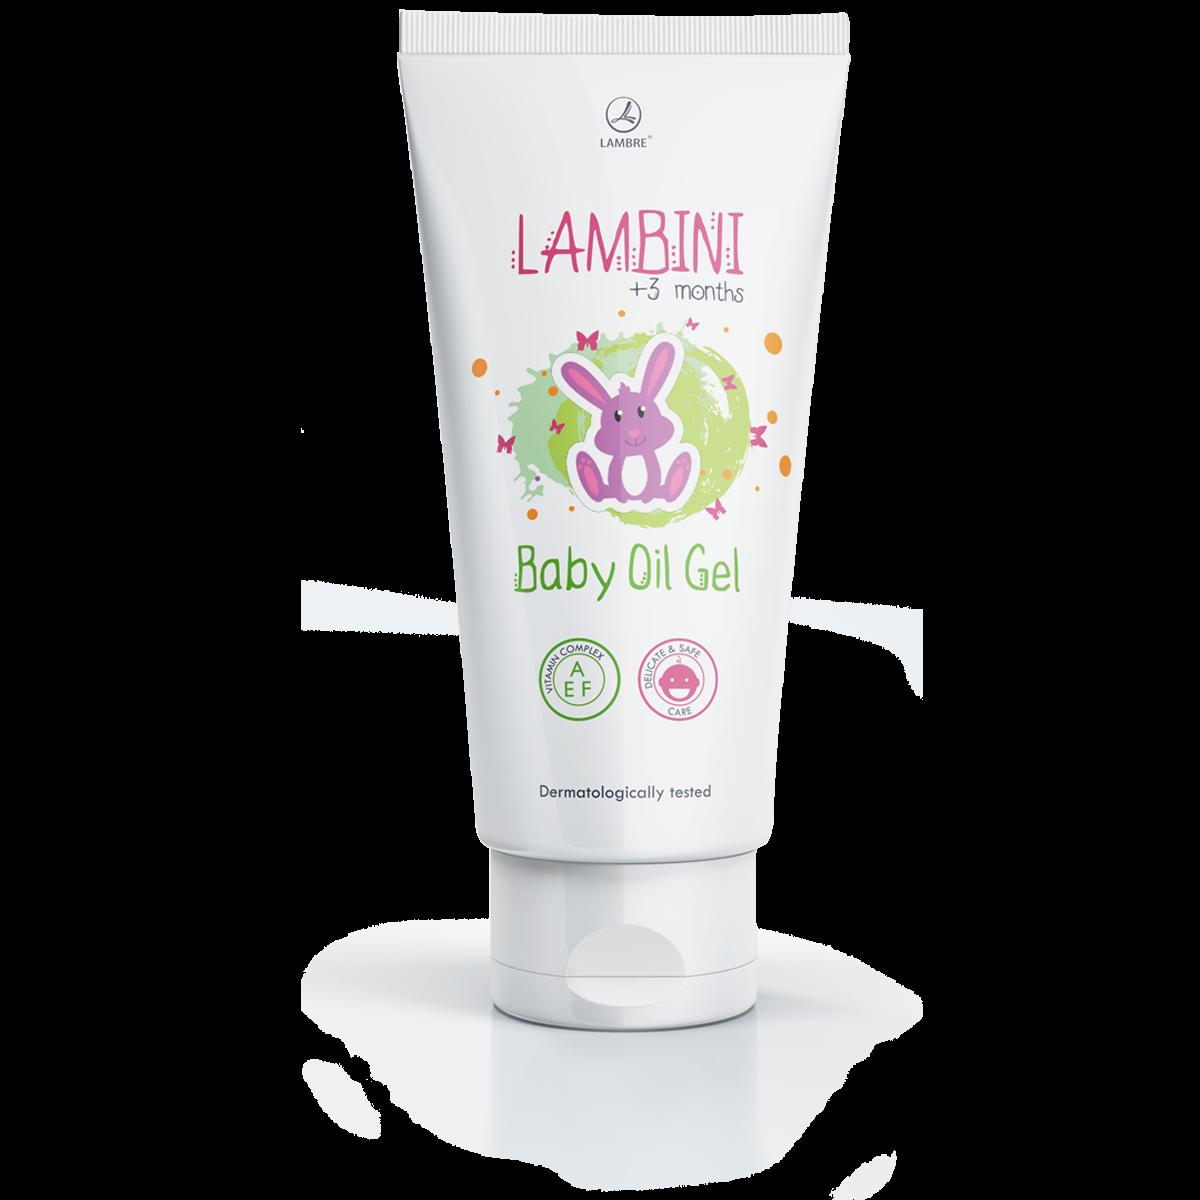 LAMBINI BABY OIL GEL Lambre Гель-масло для детей Ламбре